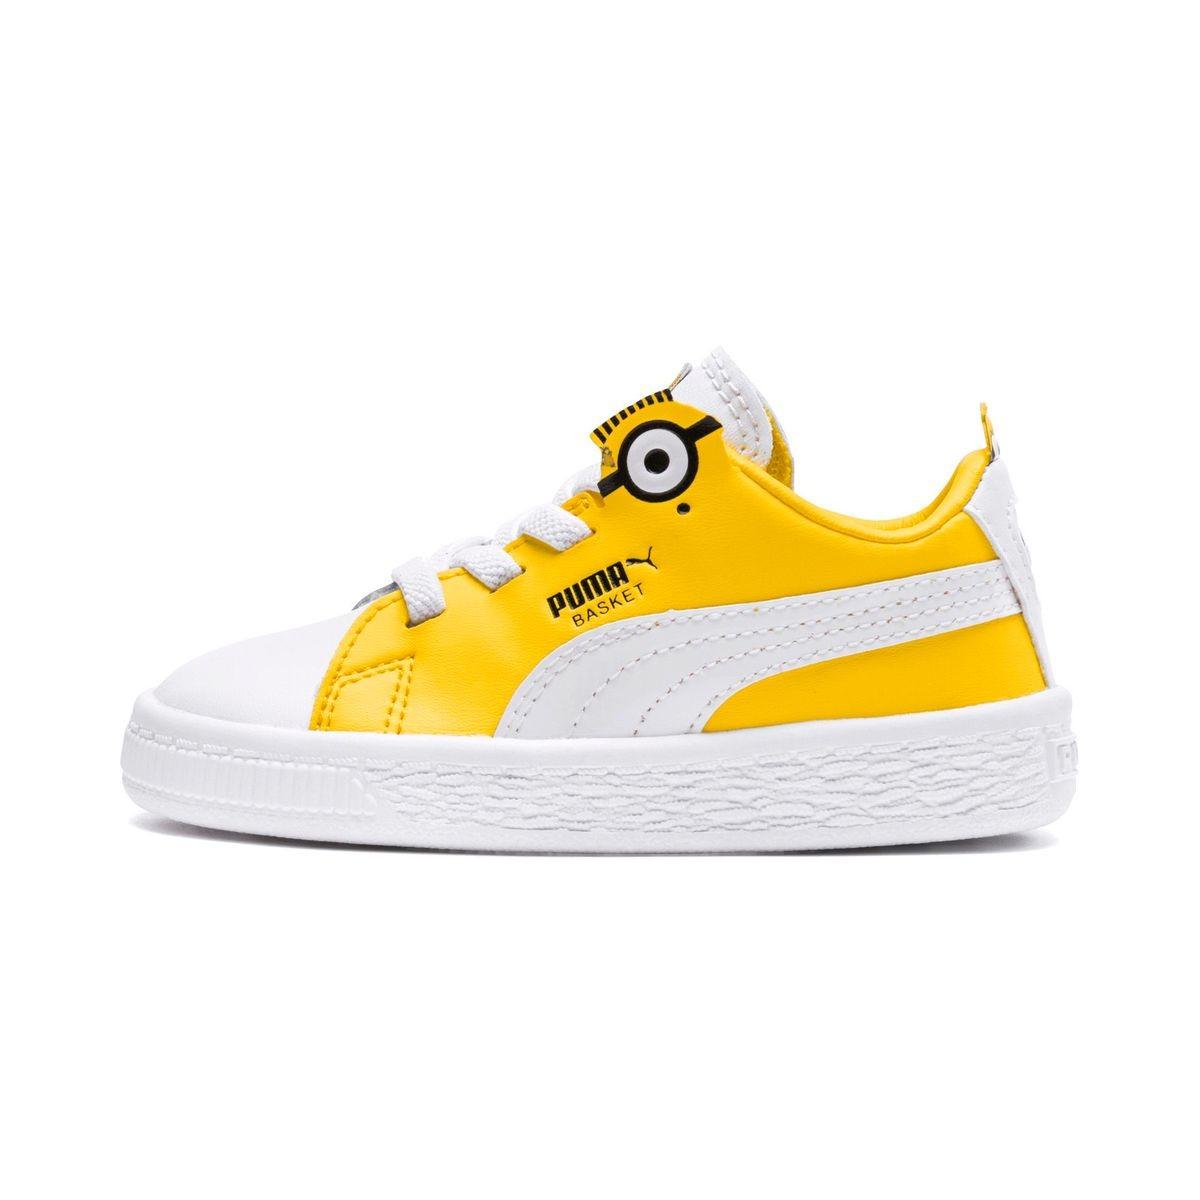 nike chaussures enfant fille 23